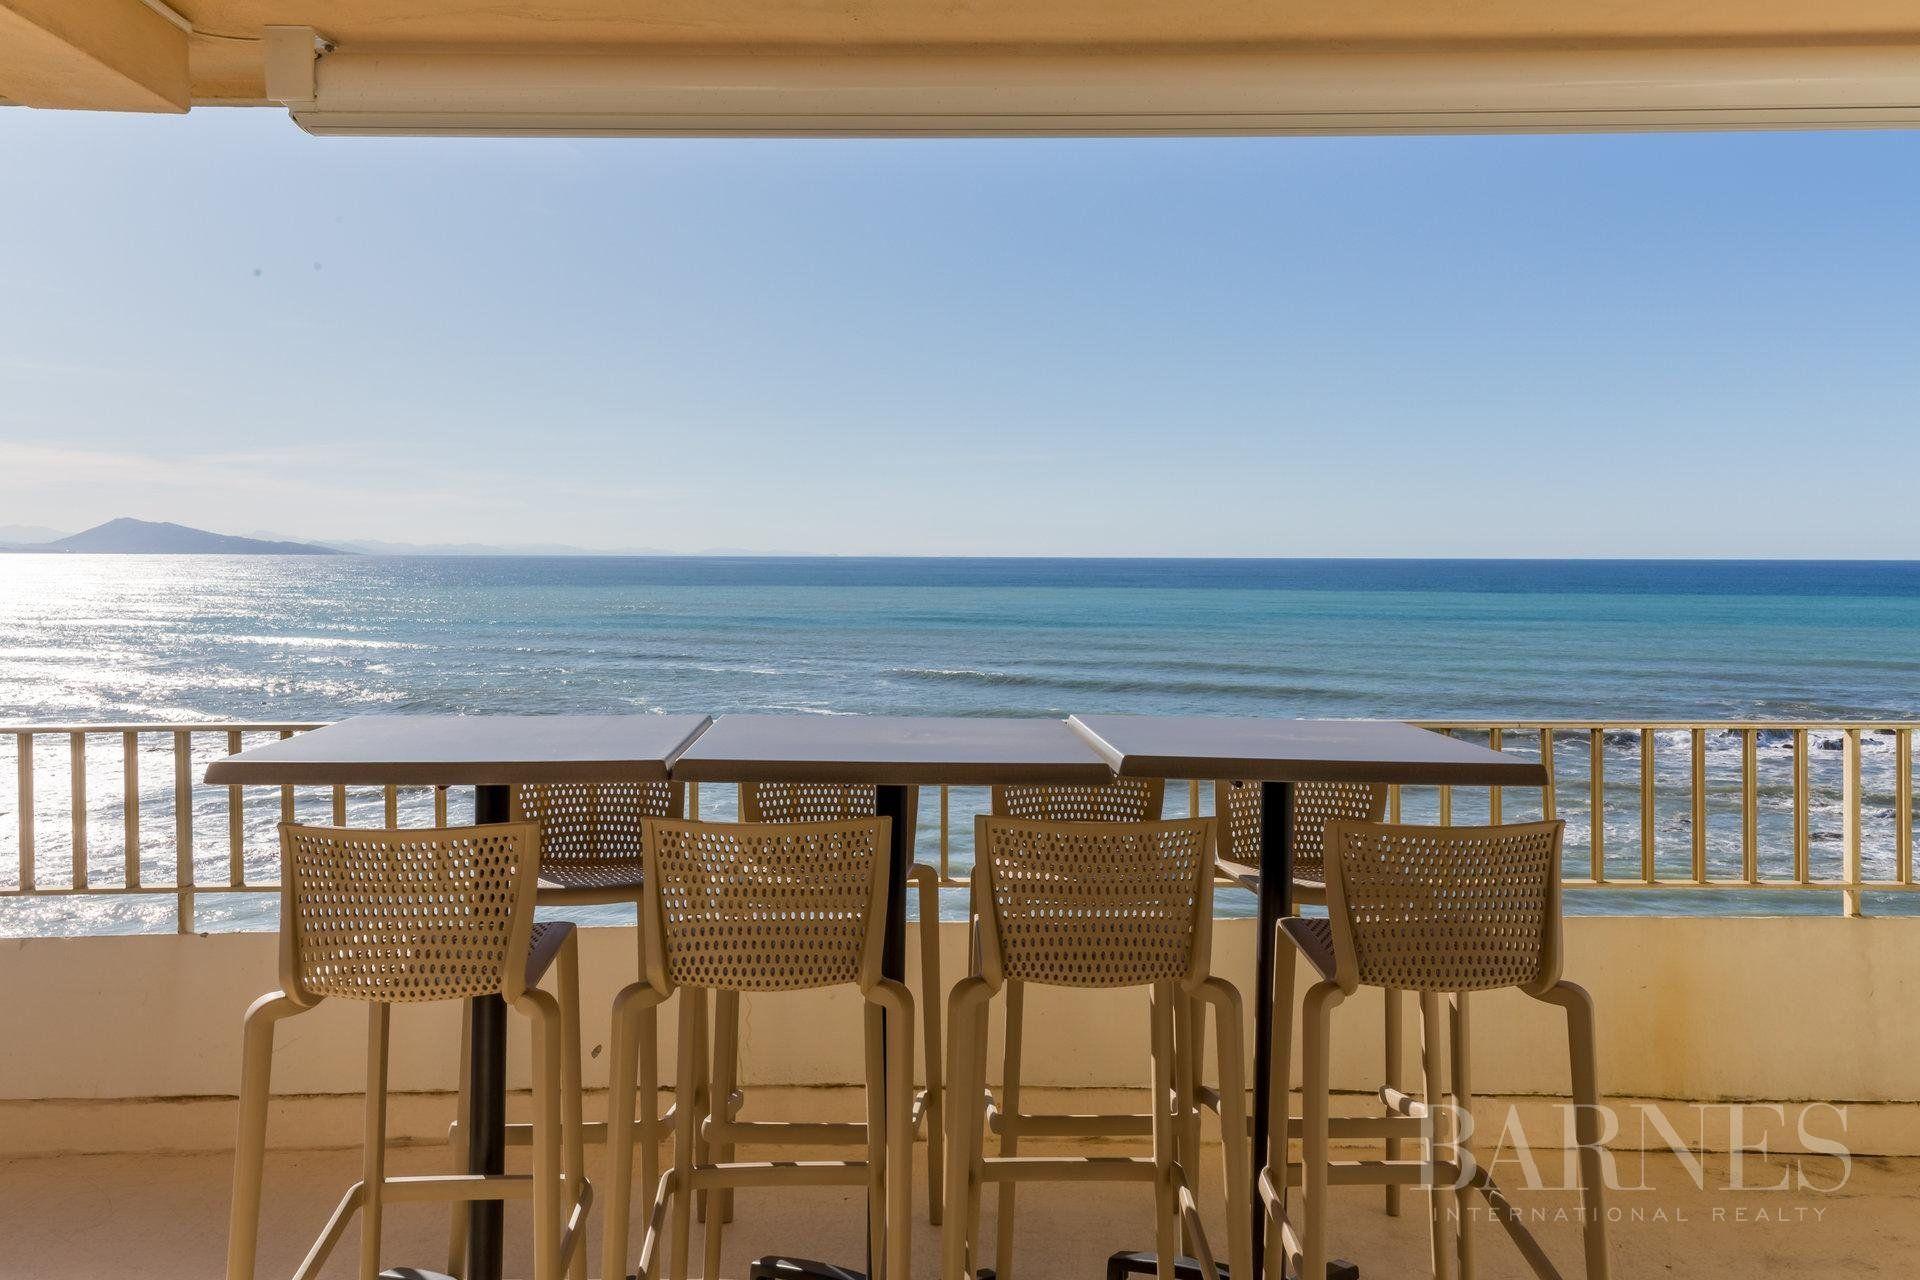 Vente Appartement Contemporain T3 70 M Vue Mer Biarritz Salled 39 Eau Biarritz Bar Table Home